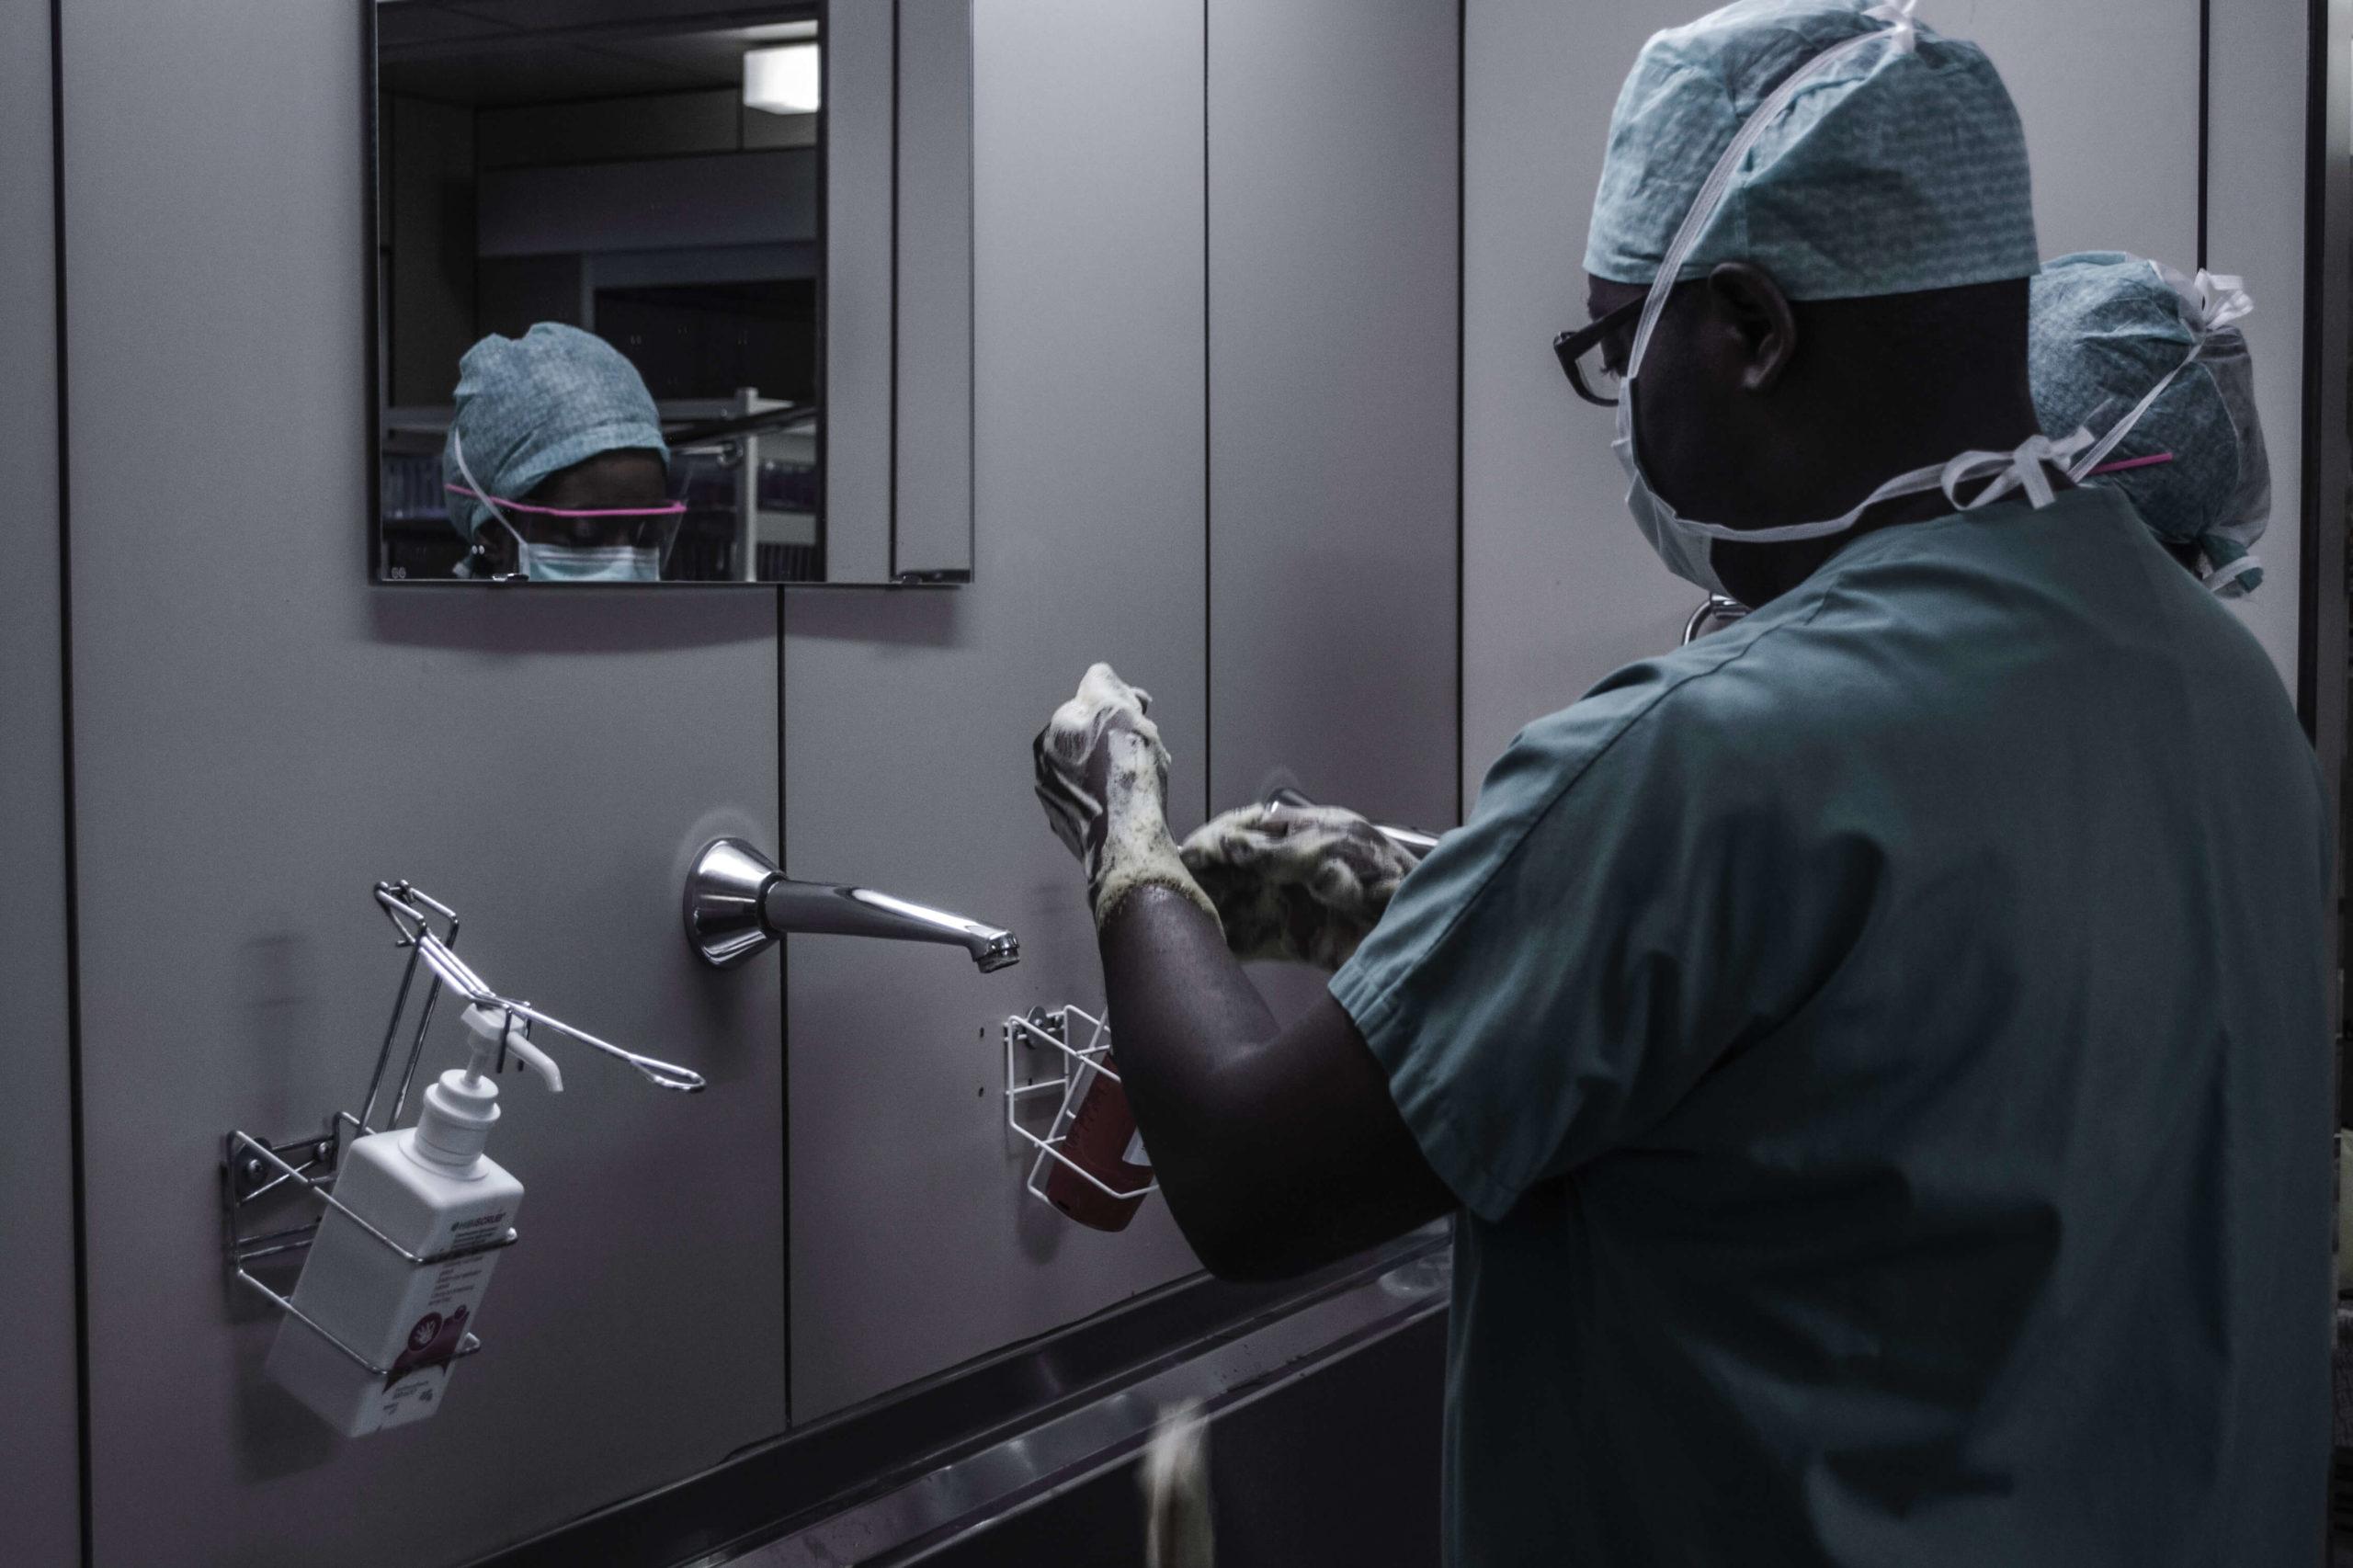 Medical staff inside a dark room